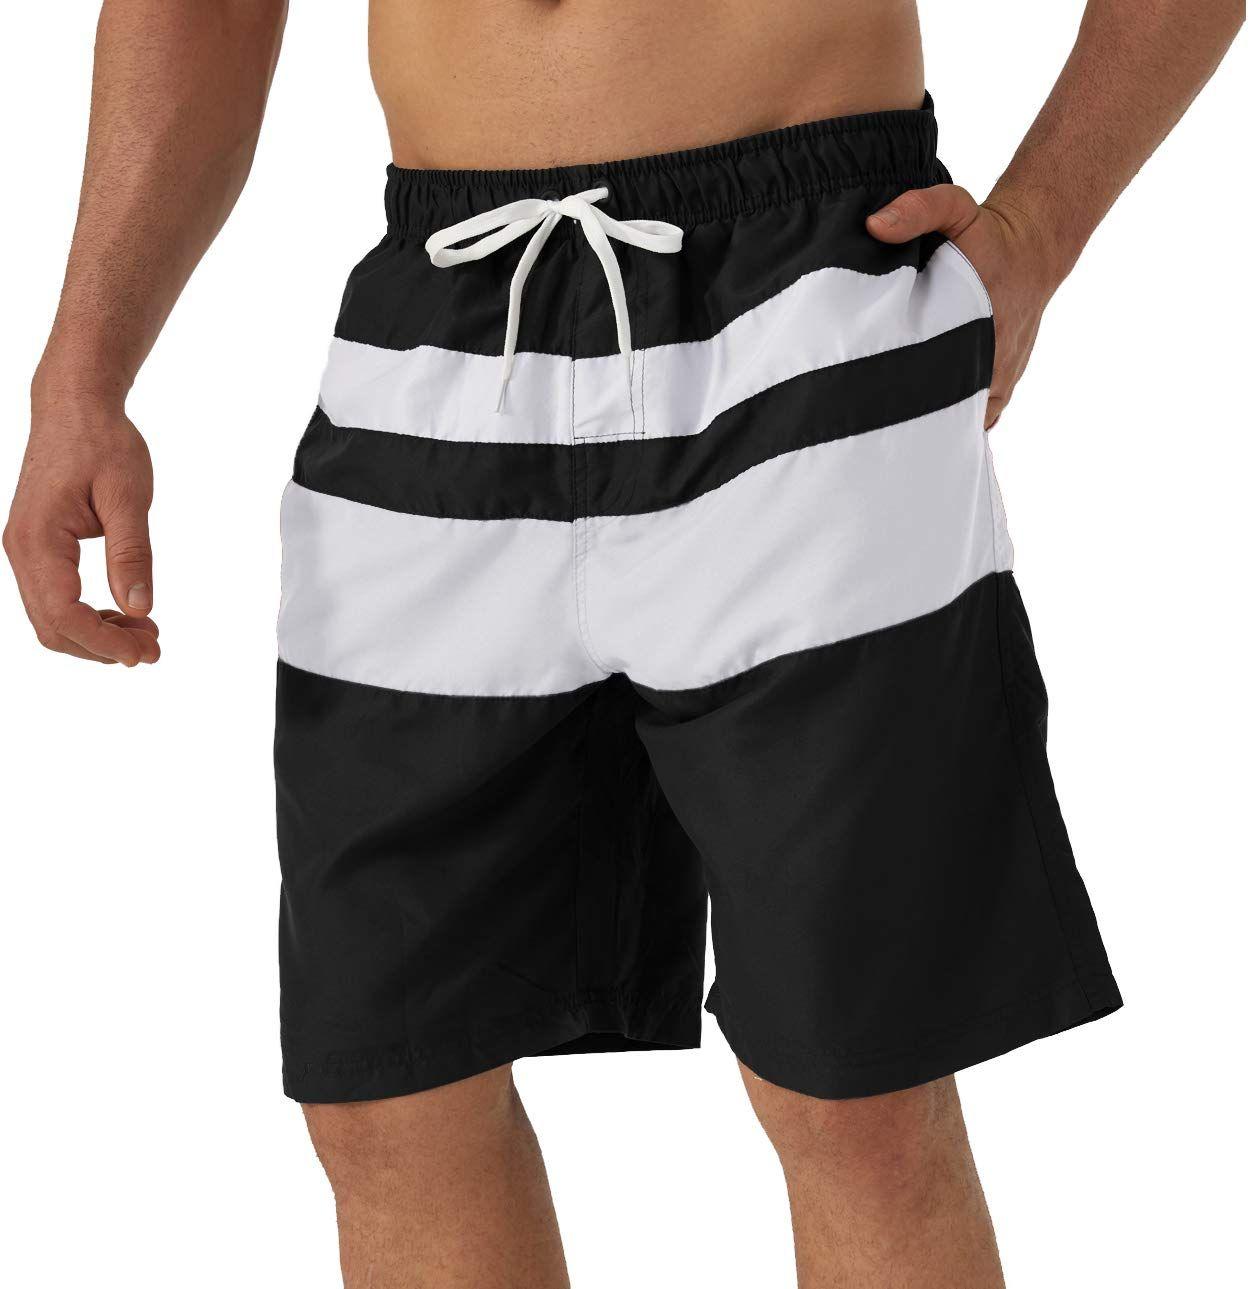 Herrenmode Badeshort Schwimmhose Bademode Boxer Board Shorts Strand Schwimmshort